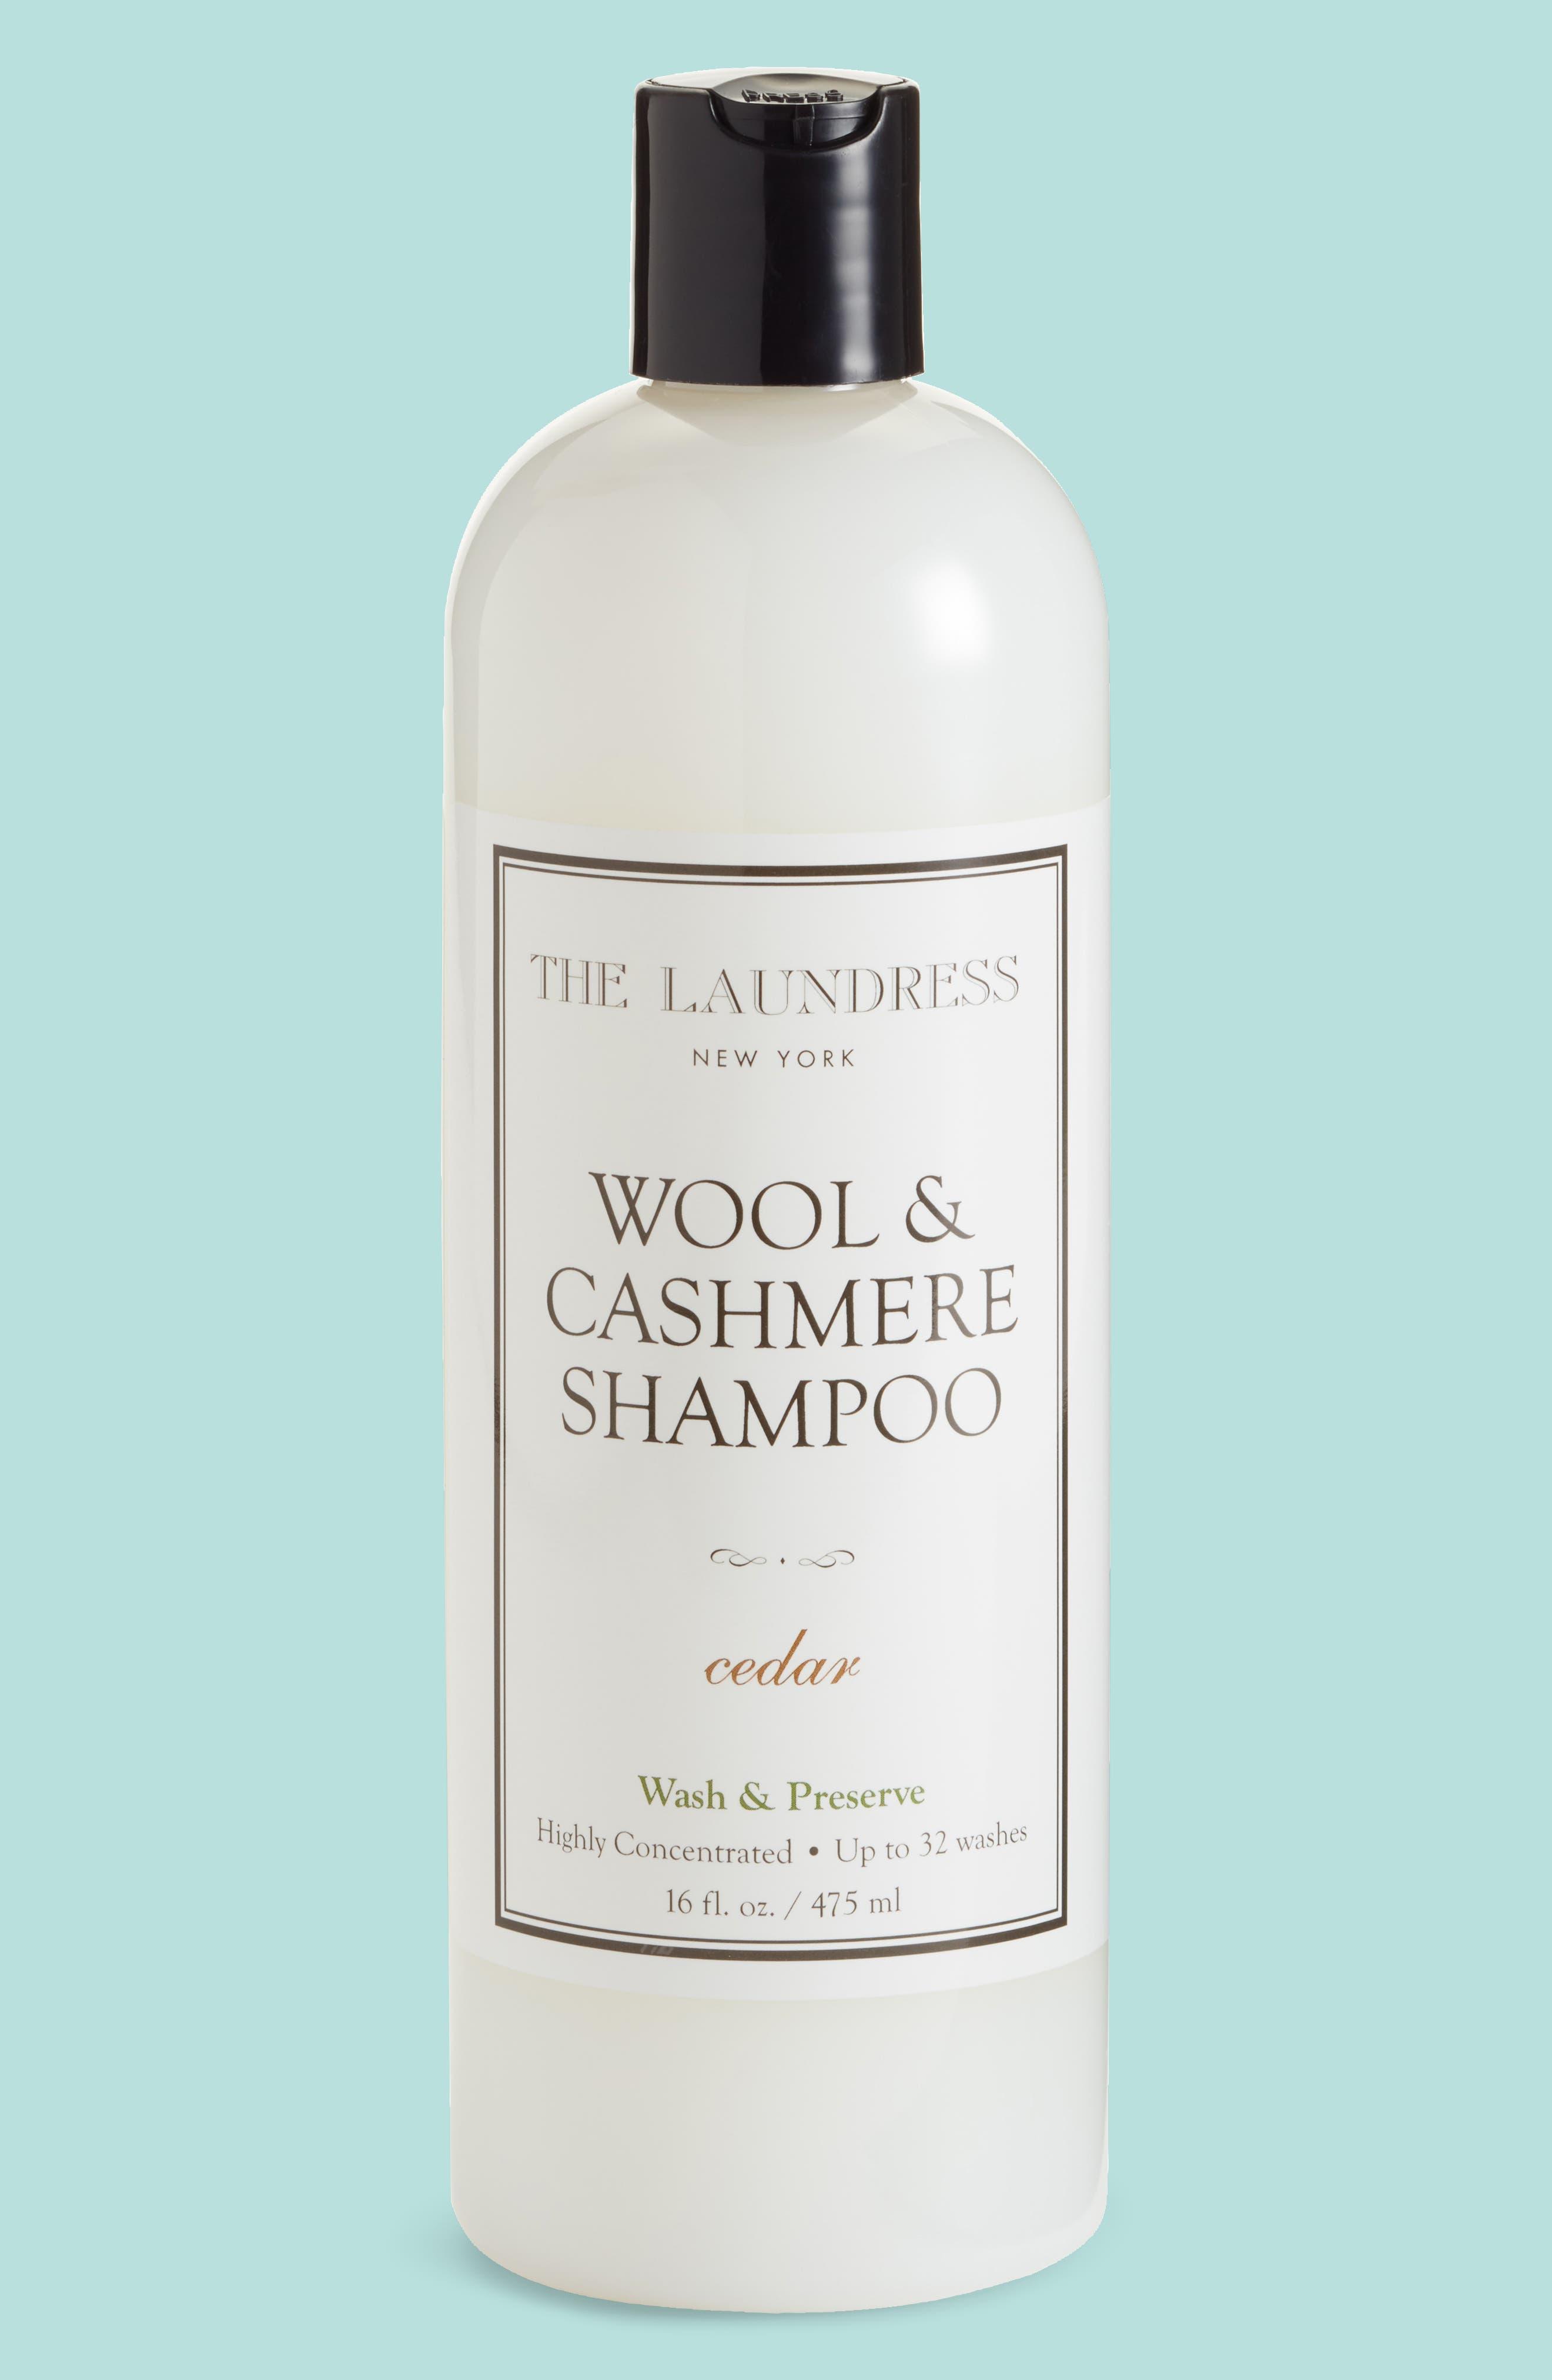 Wool & Cashmere Shampoo,                         Main,                         color, Cedar